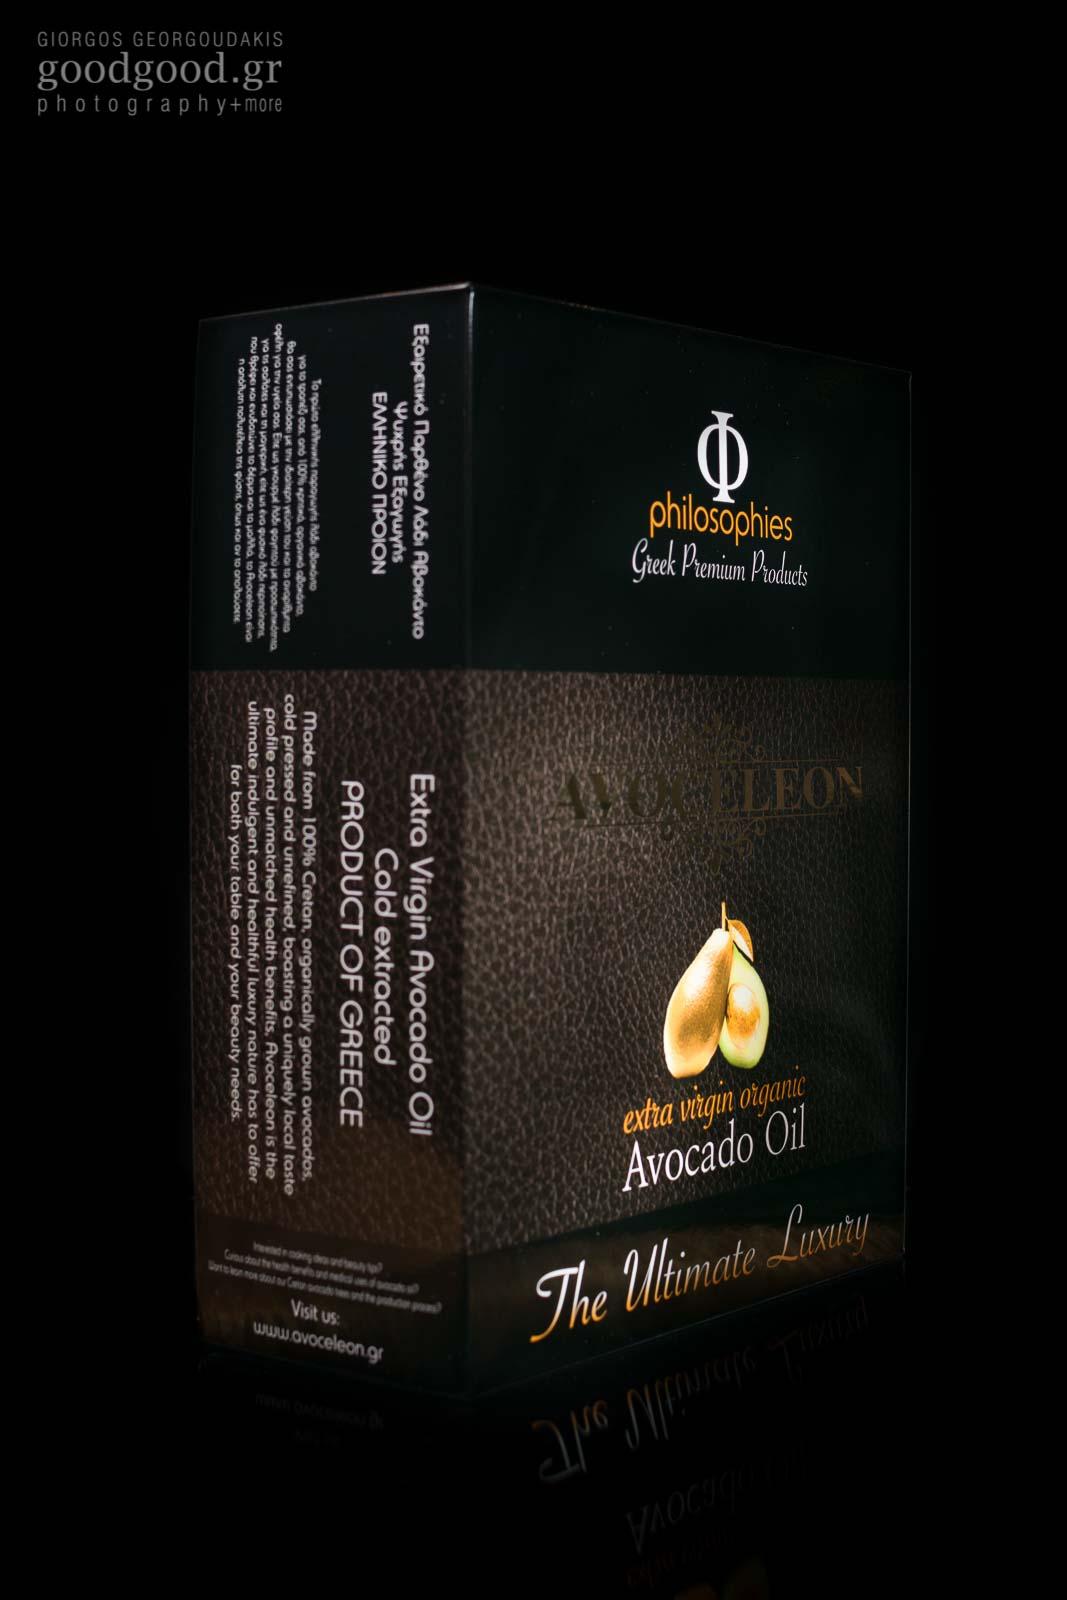 Avoceleon, avocado oil premium package, product photographed in dark background